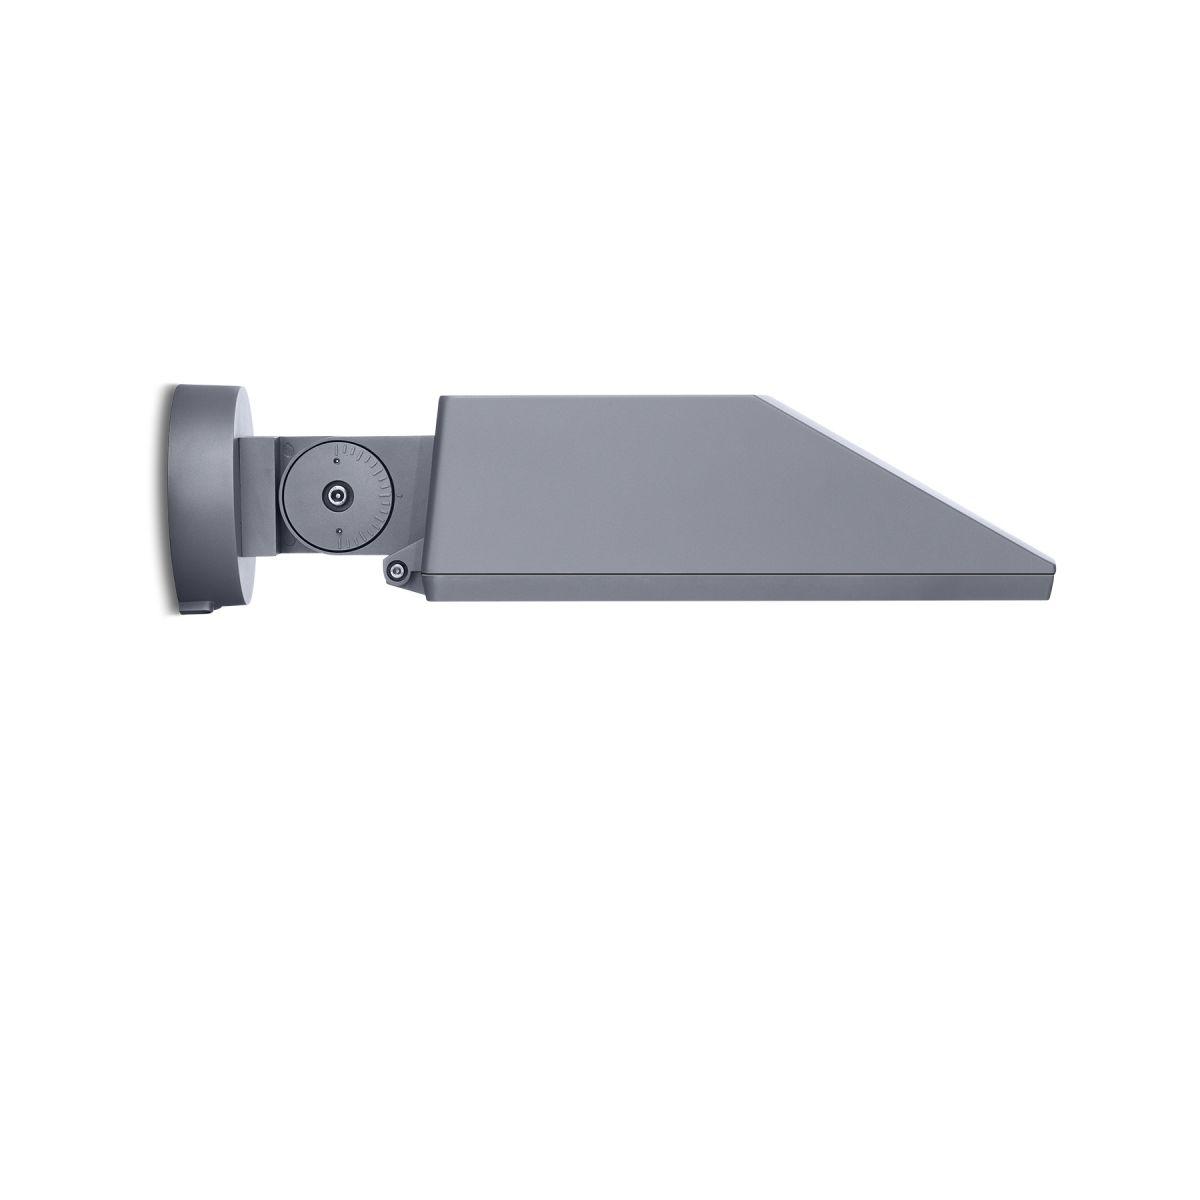 Medium SIROCCO - Surface Washer / Asymmetric